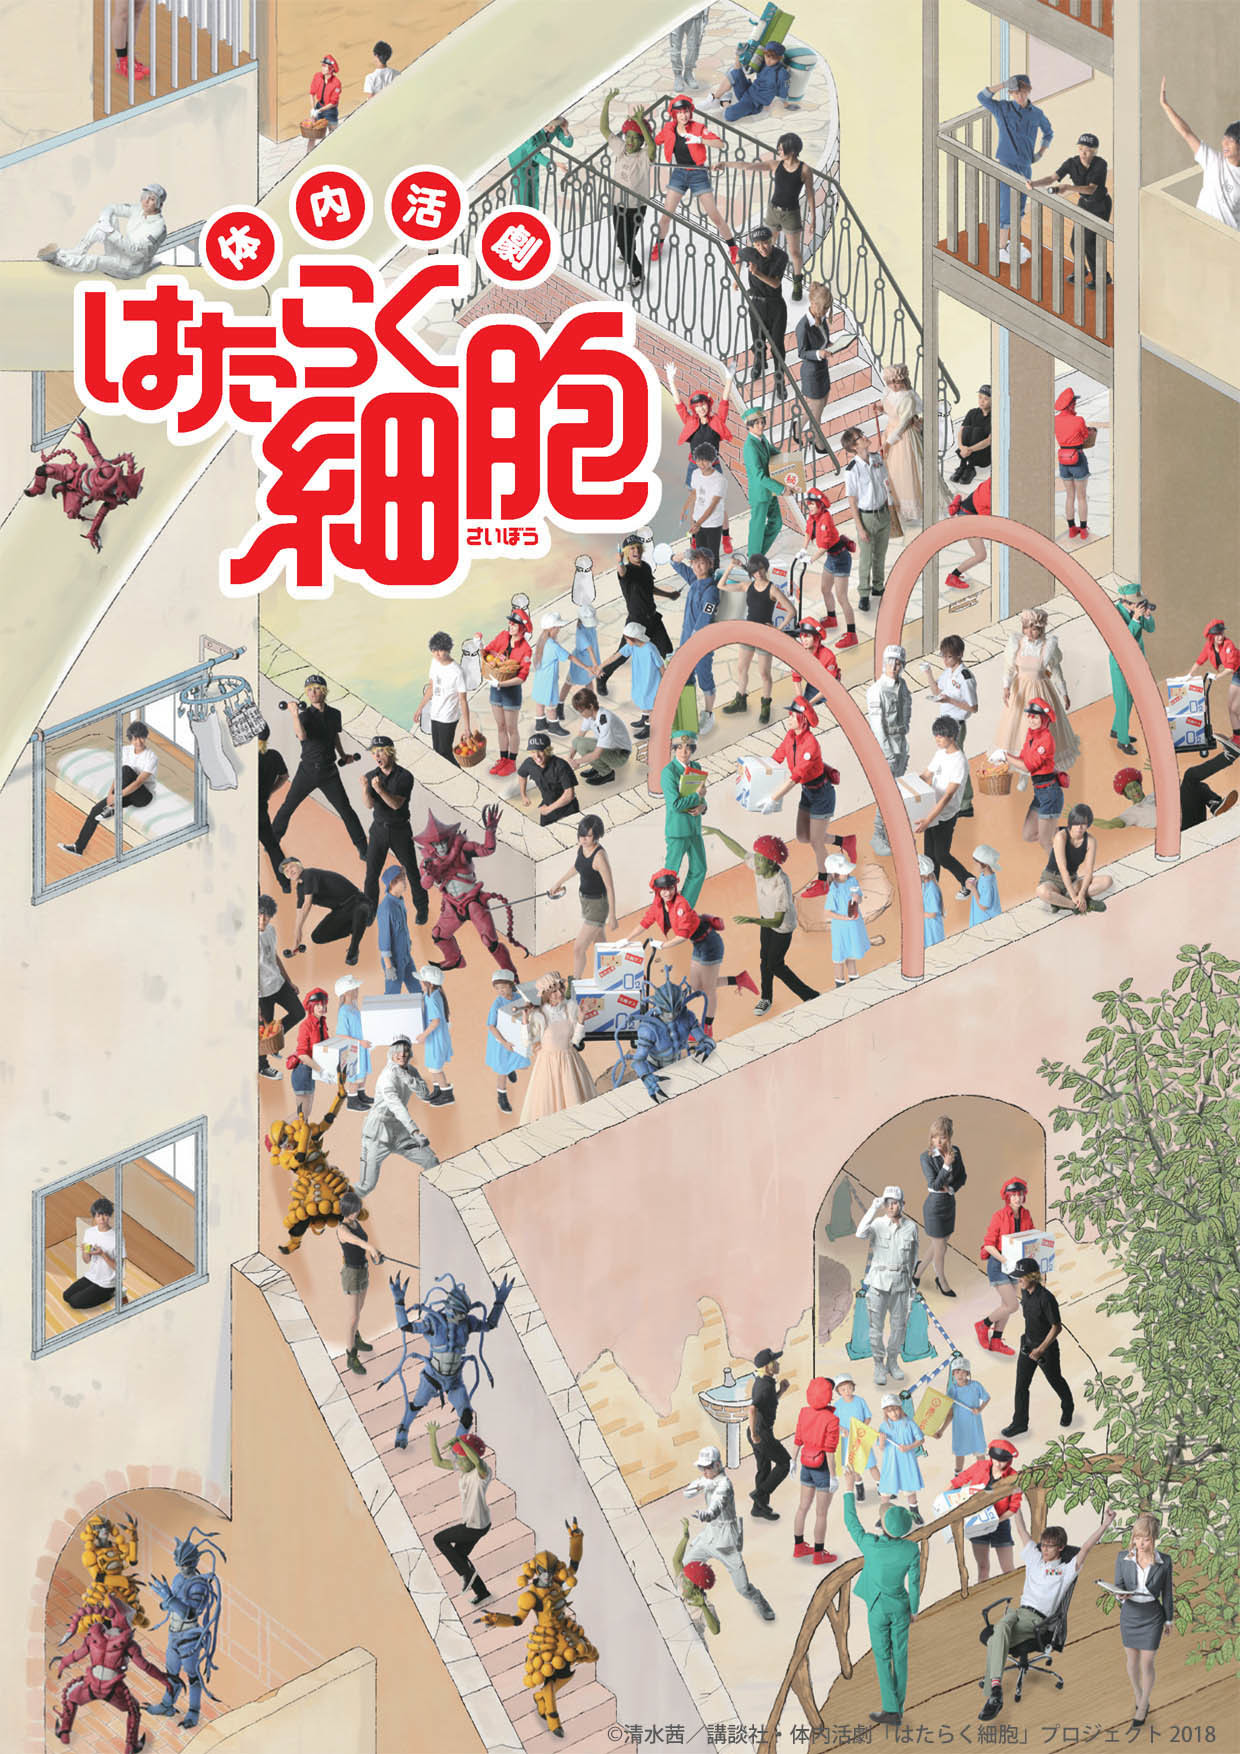 (C)清水茜/講談社・体内活劇「はたらく細胞」プロジェクト 2018